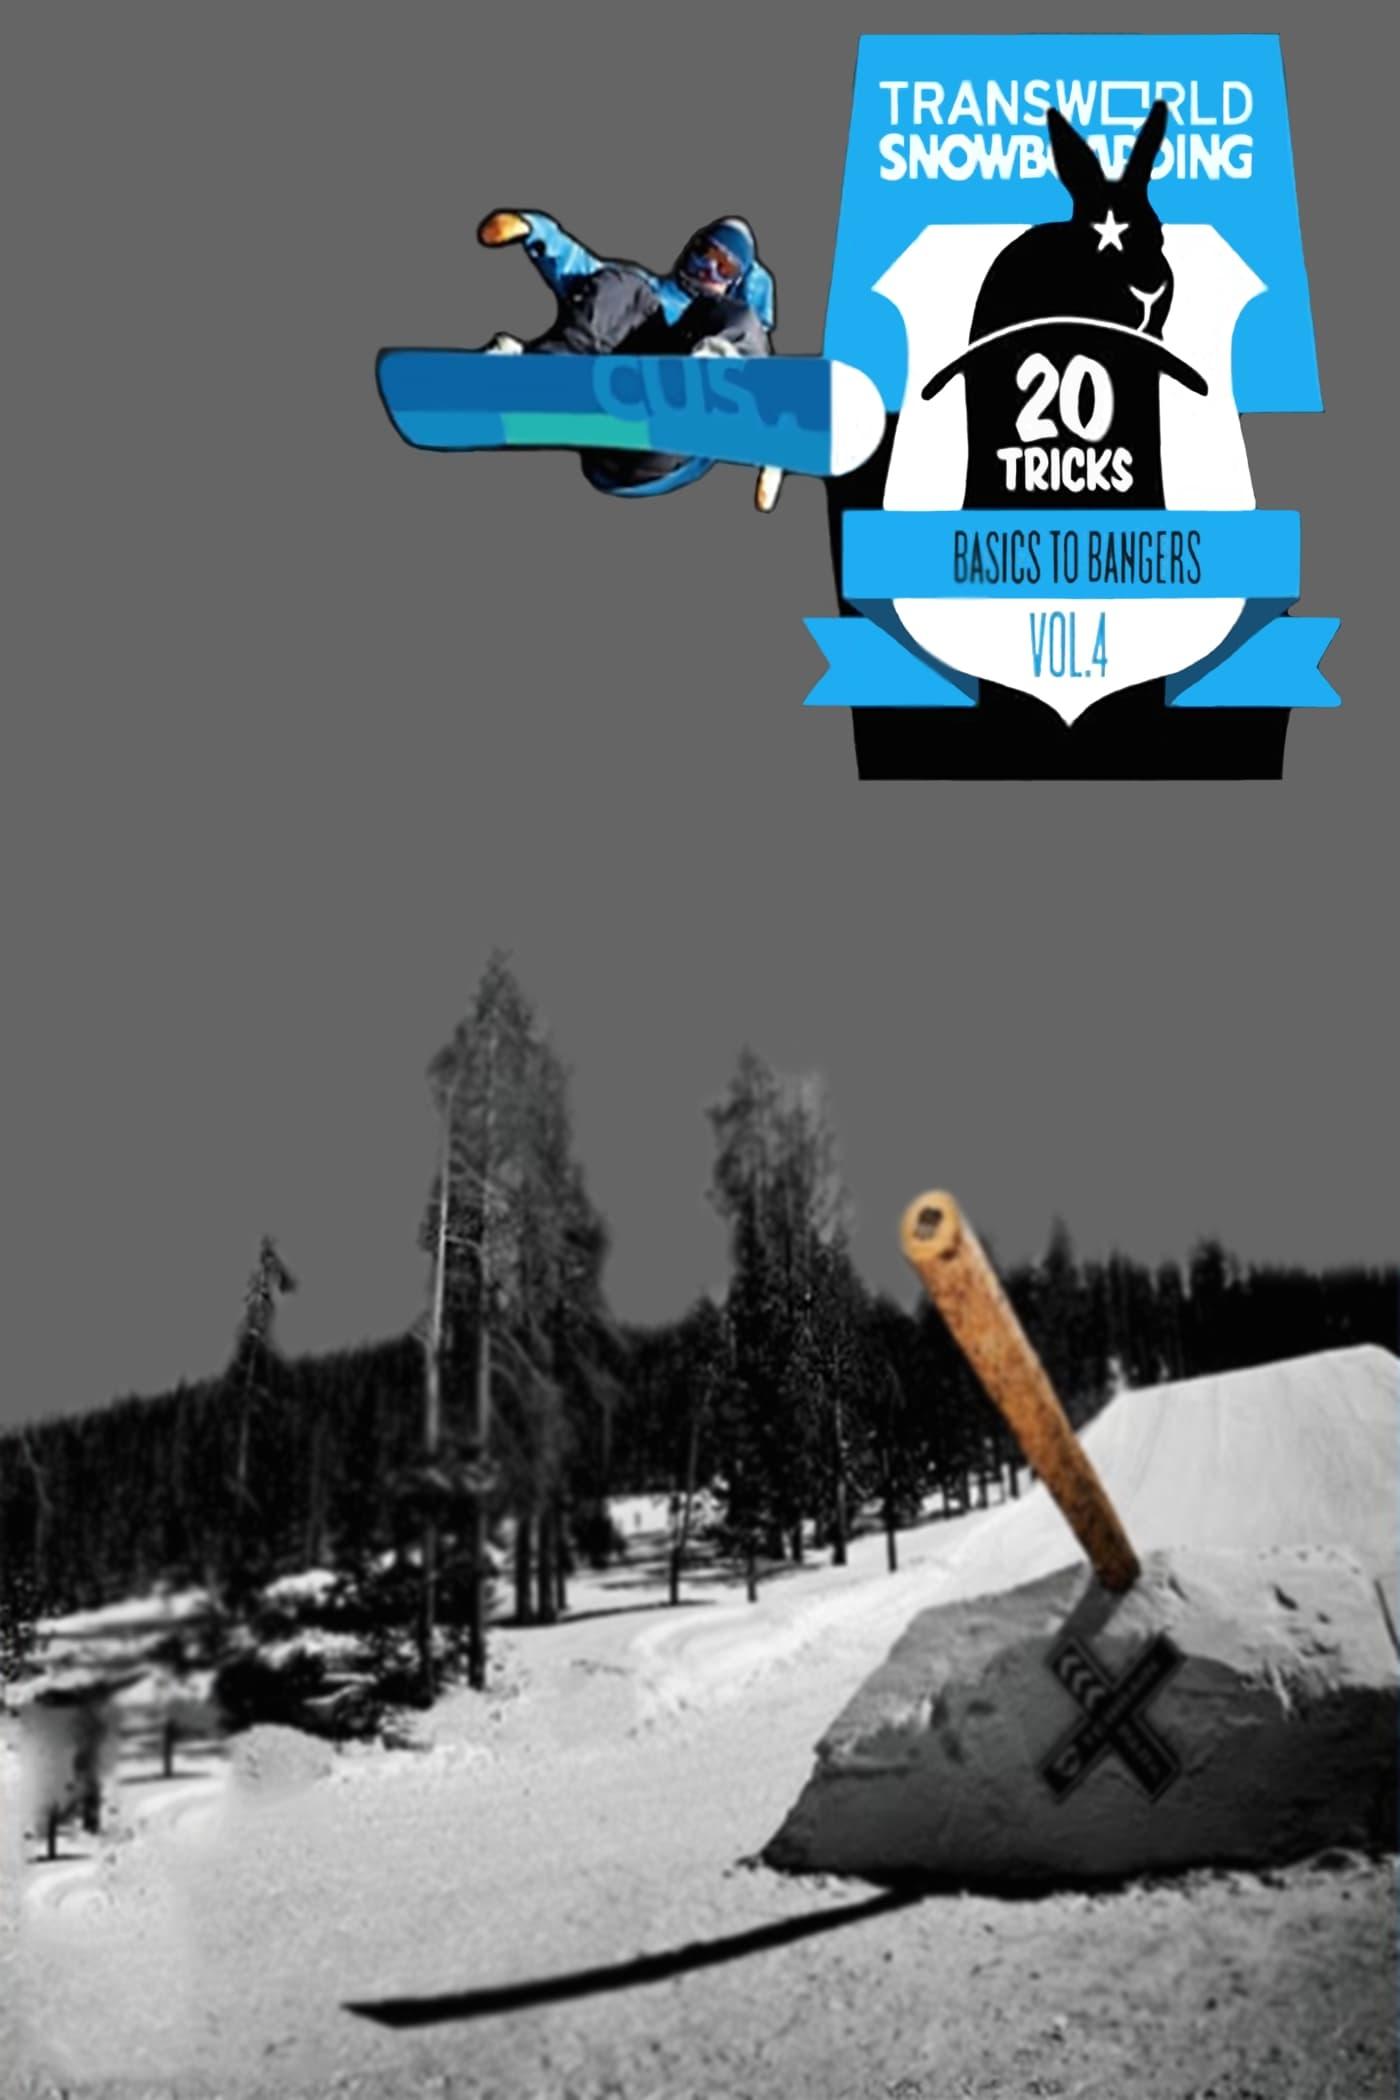 Transworld Snowboarding 20 Tricks - Vol. 4 on FREECABLE TV